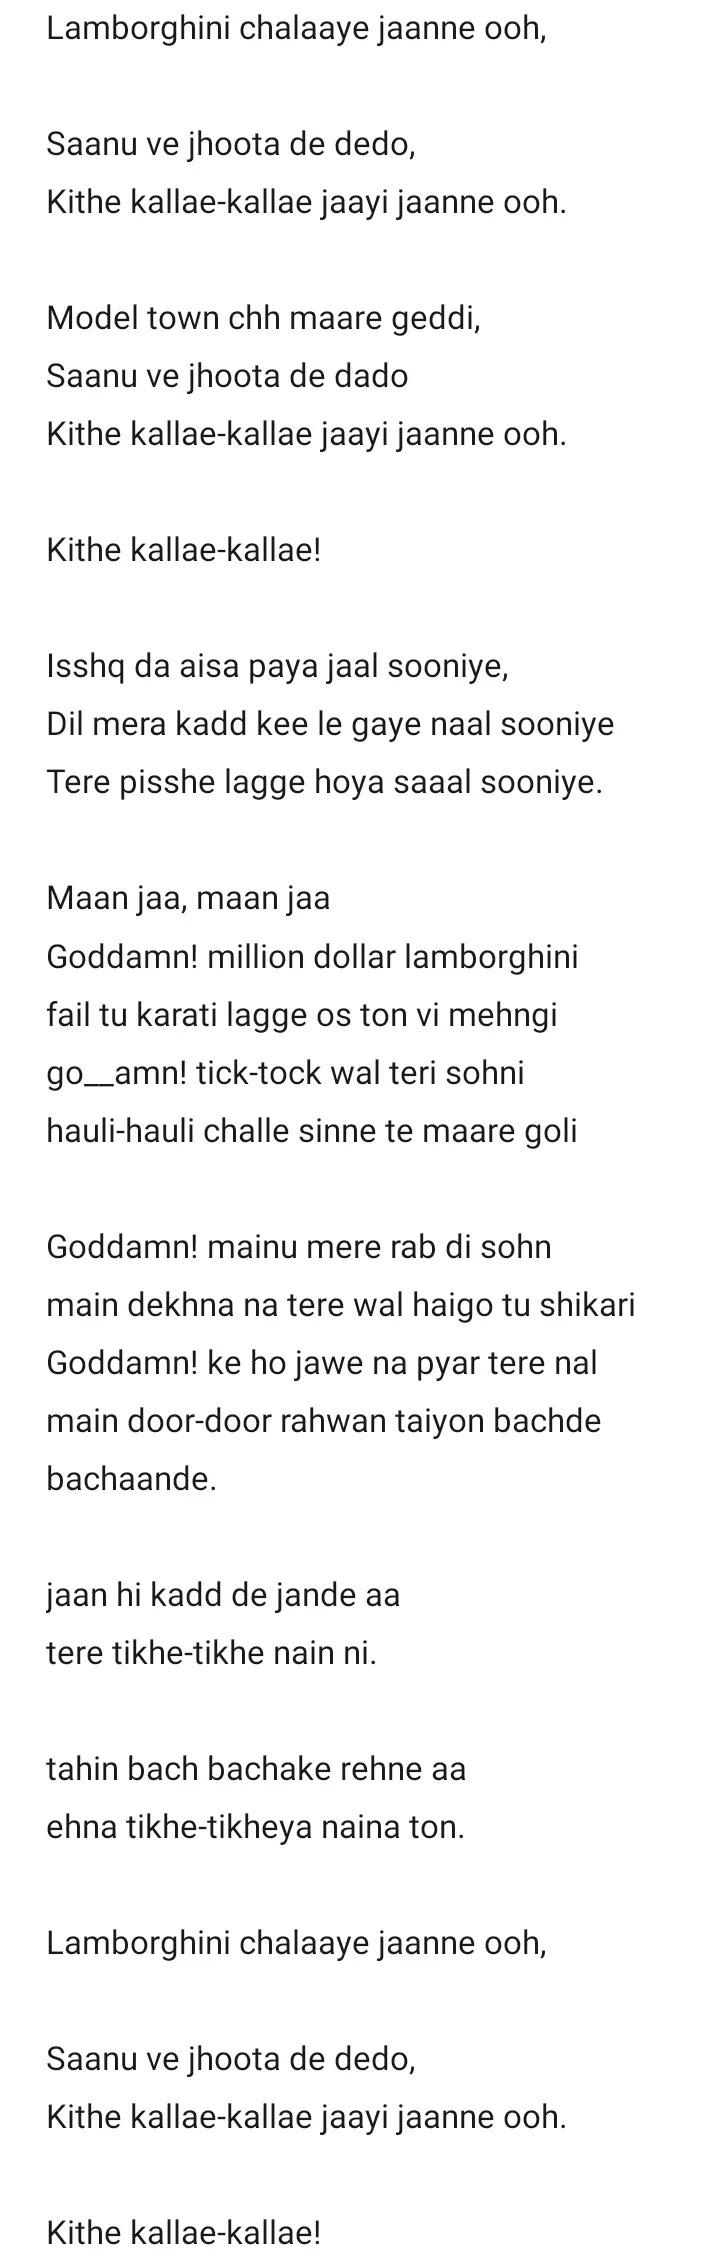 lamborghini lyrics song - the doorbeen ft. Raghani | speed records